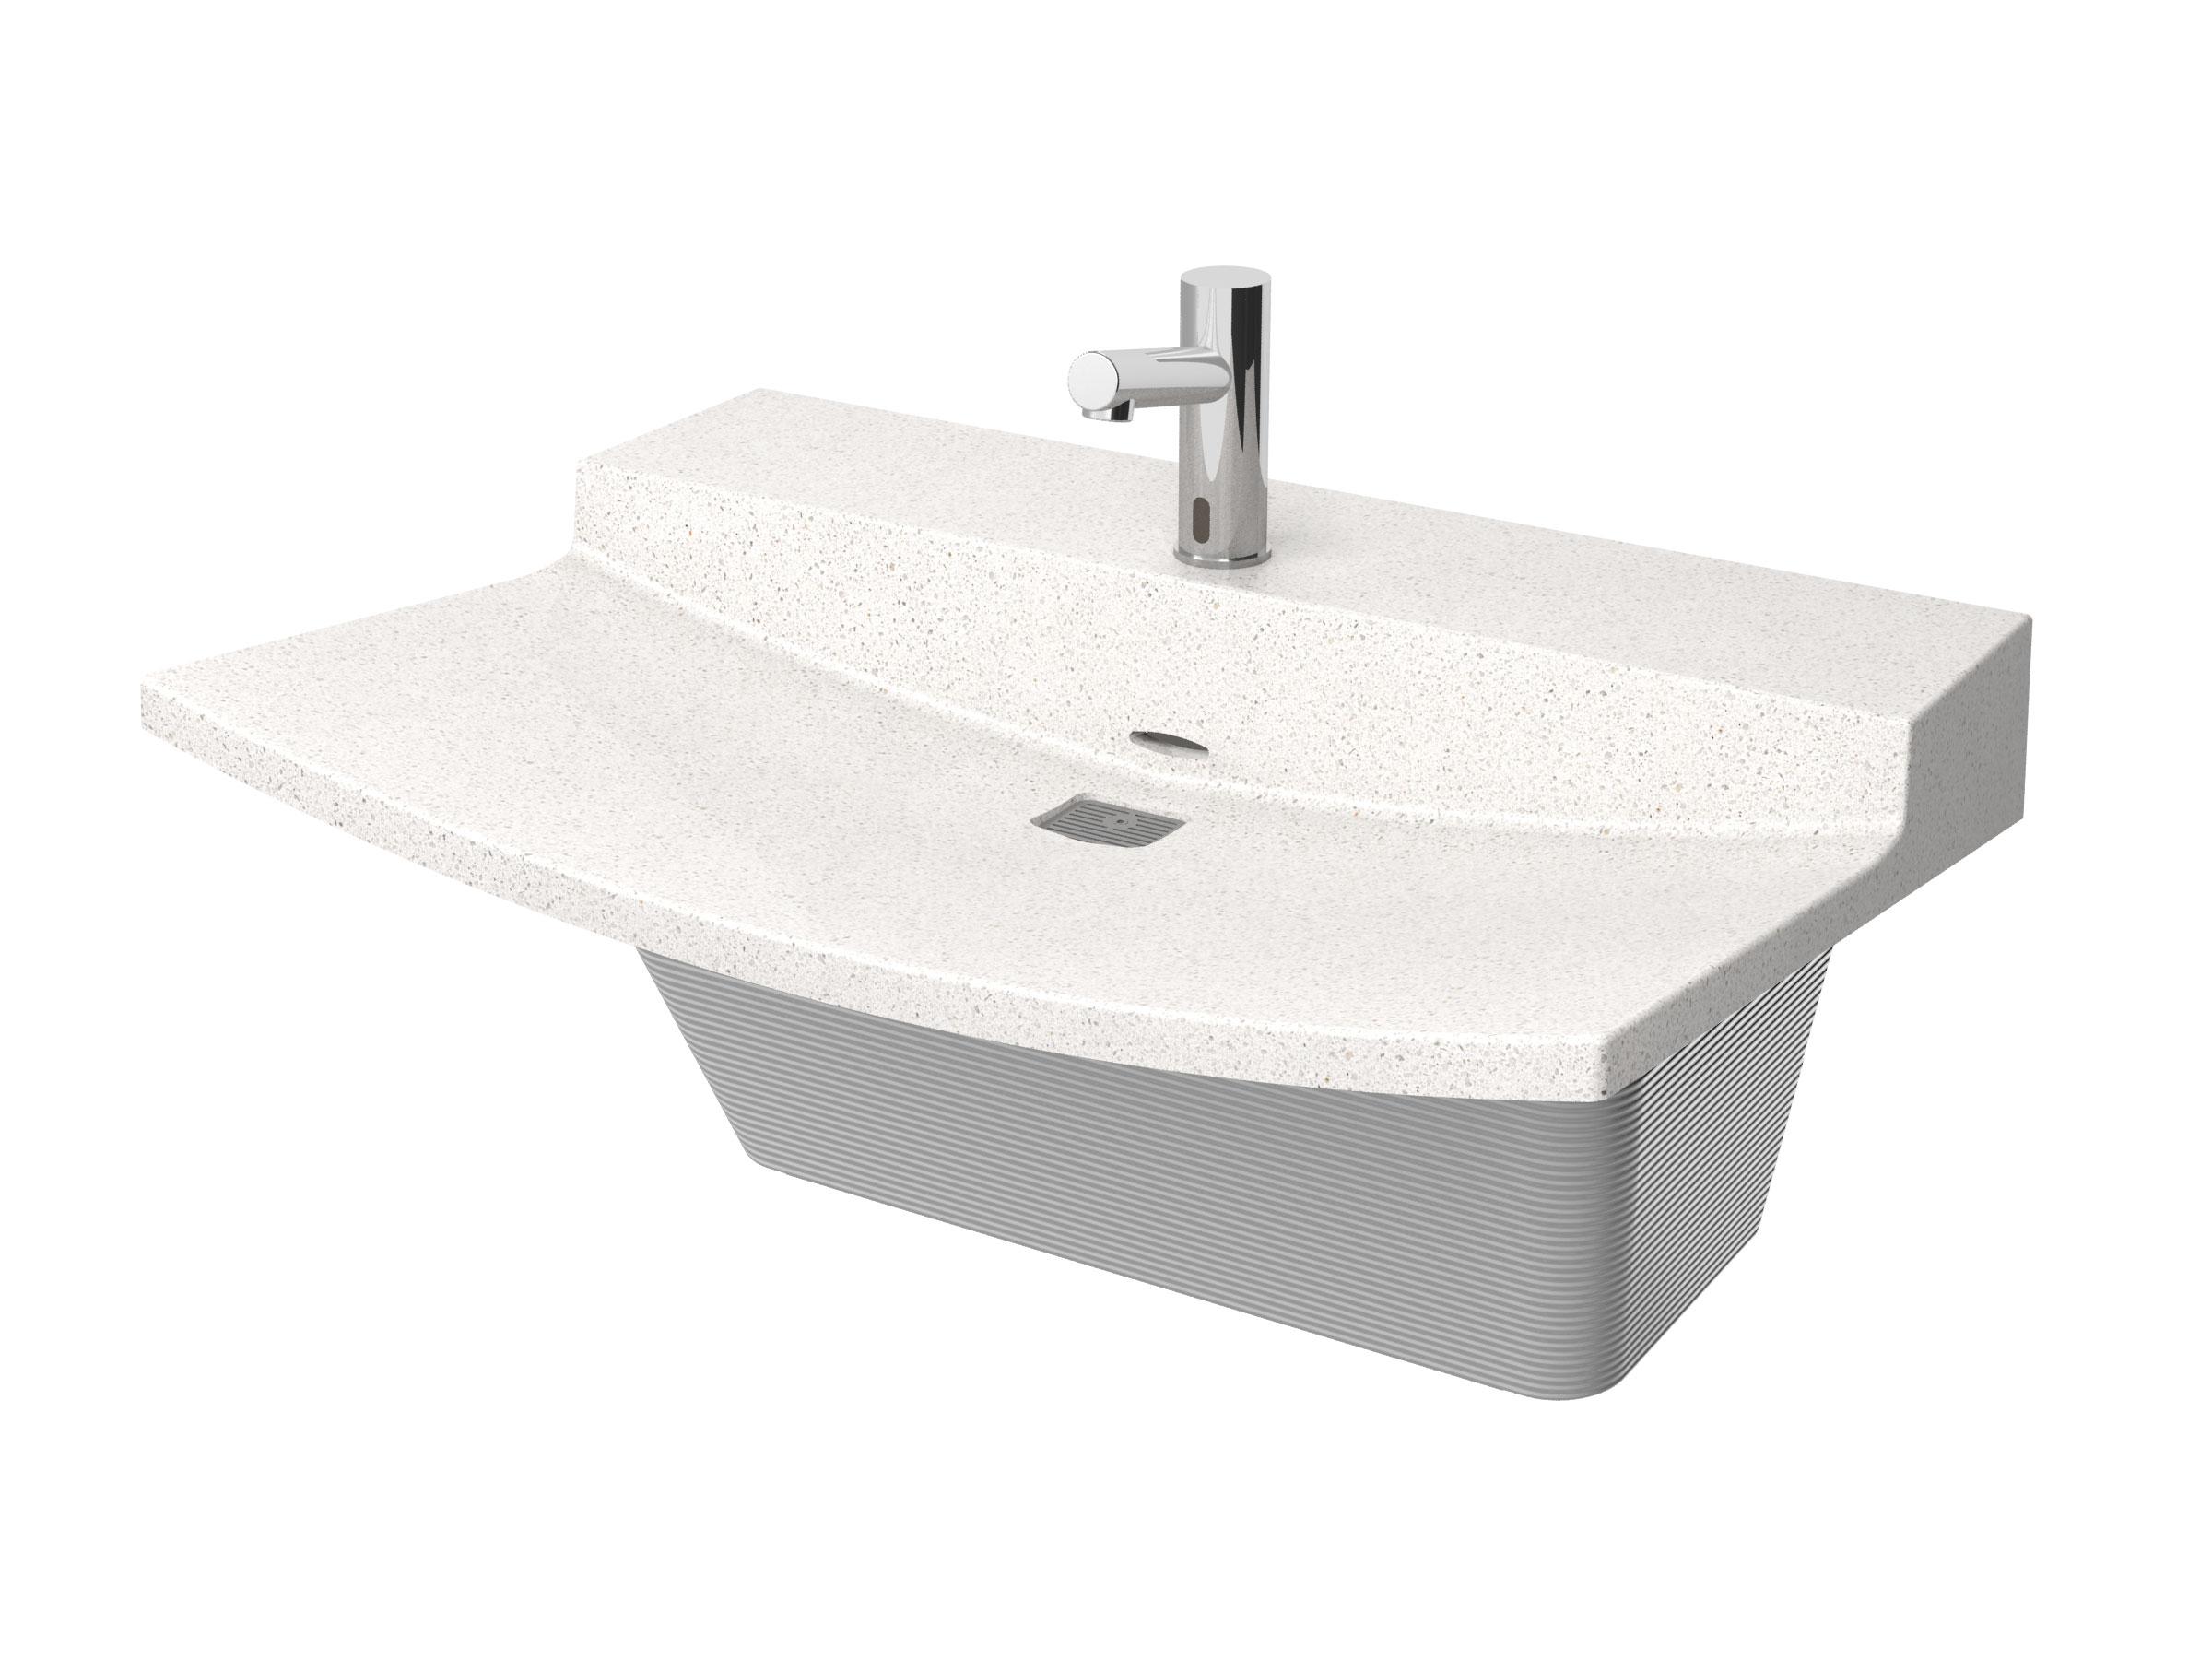 Bradley Commercial Sinks : Station L-Series Verge Lavatory System - Model LVLD1